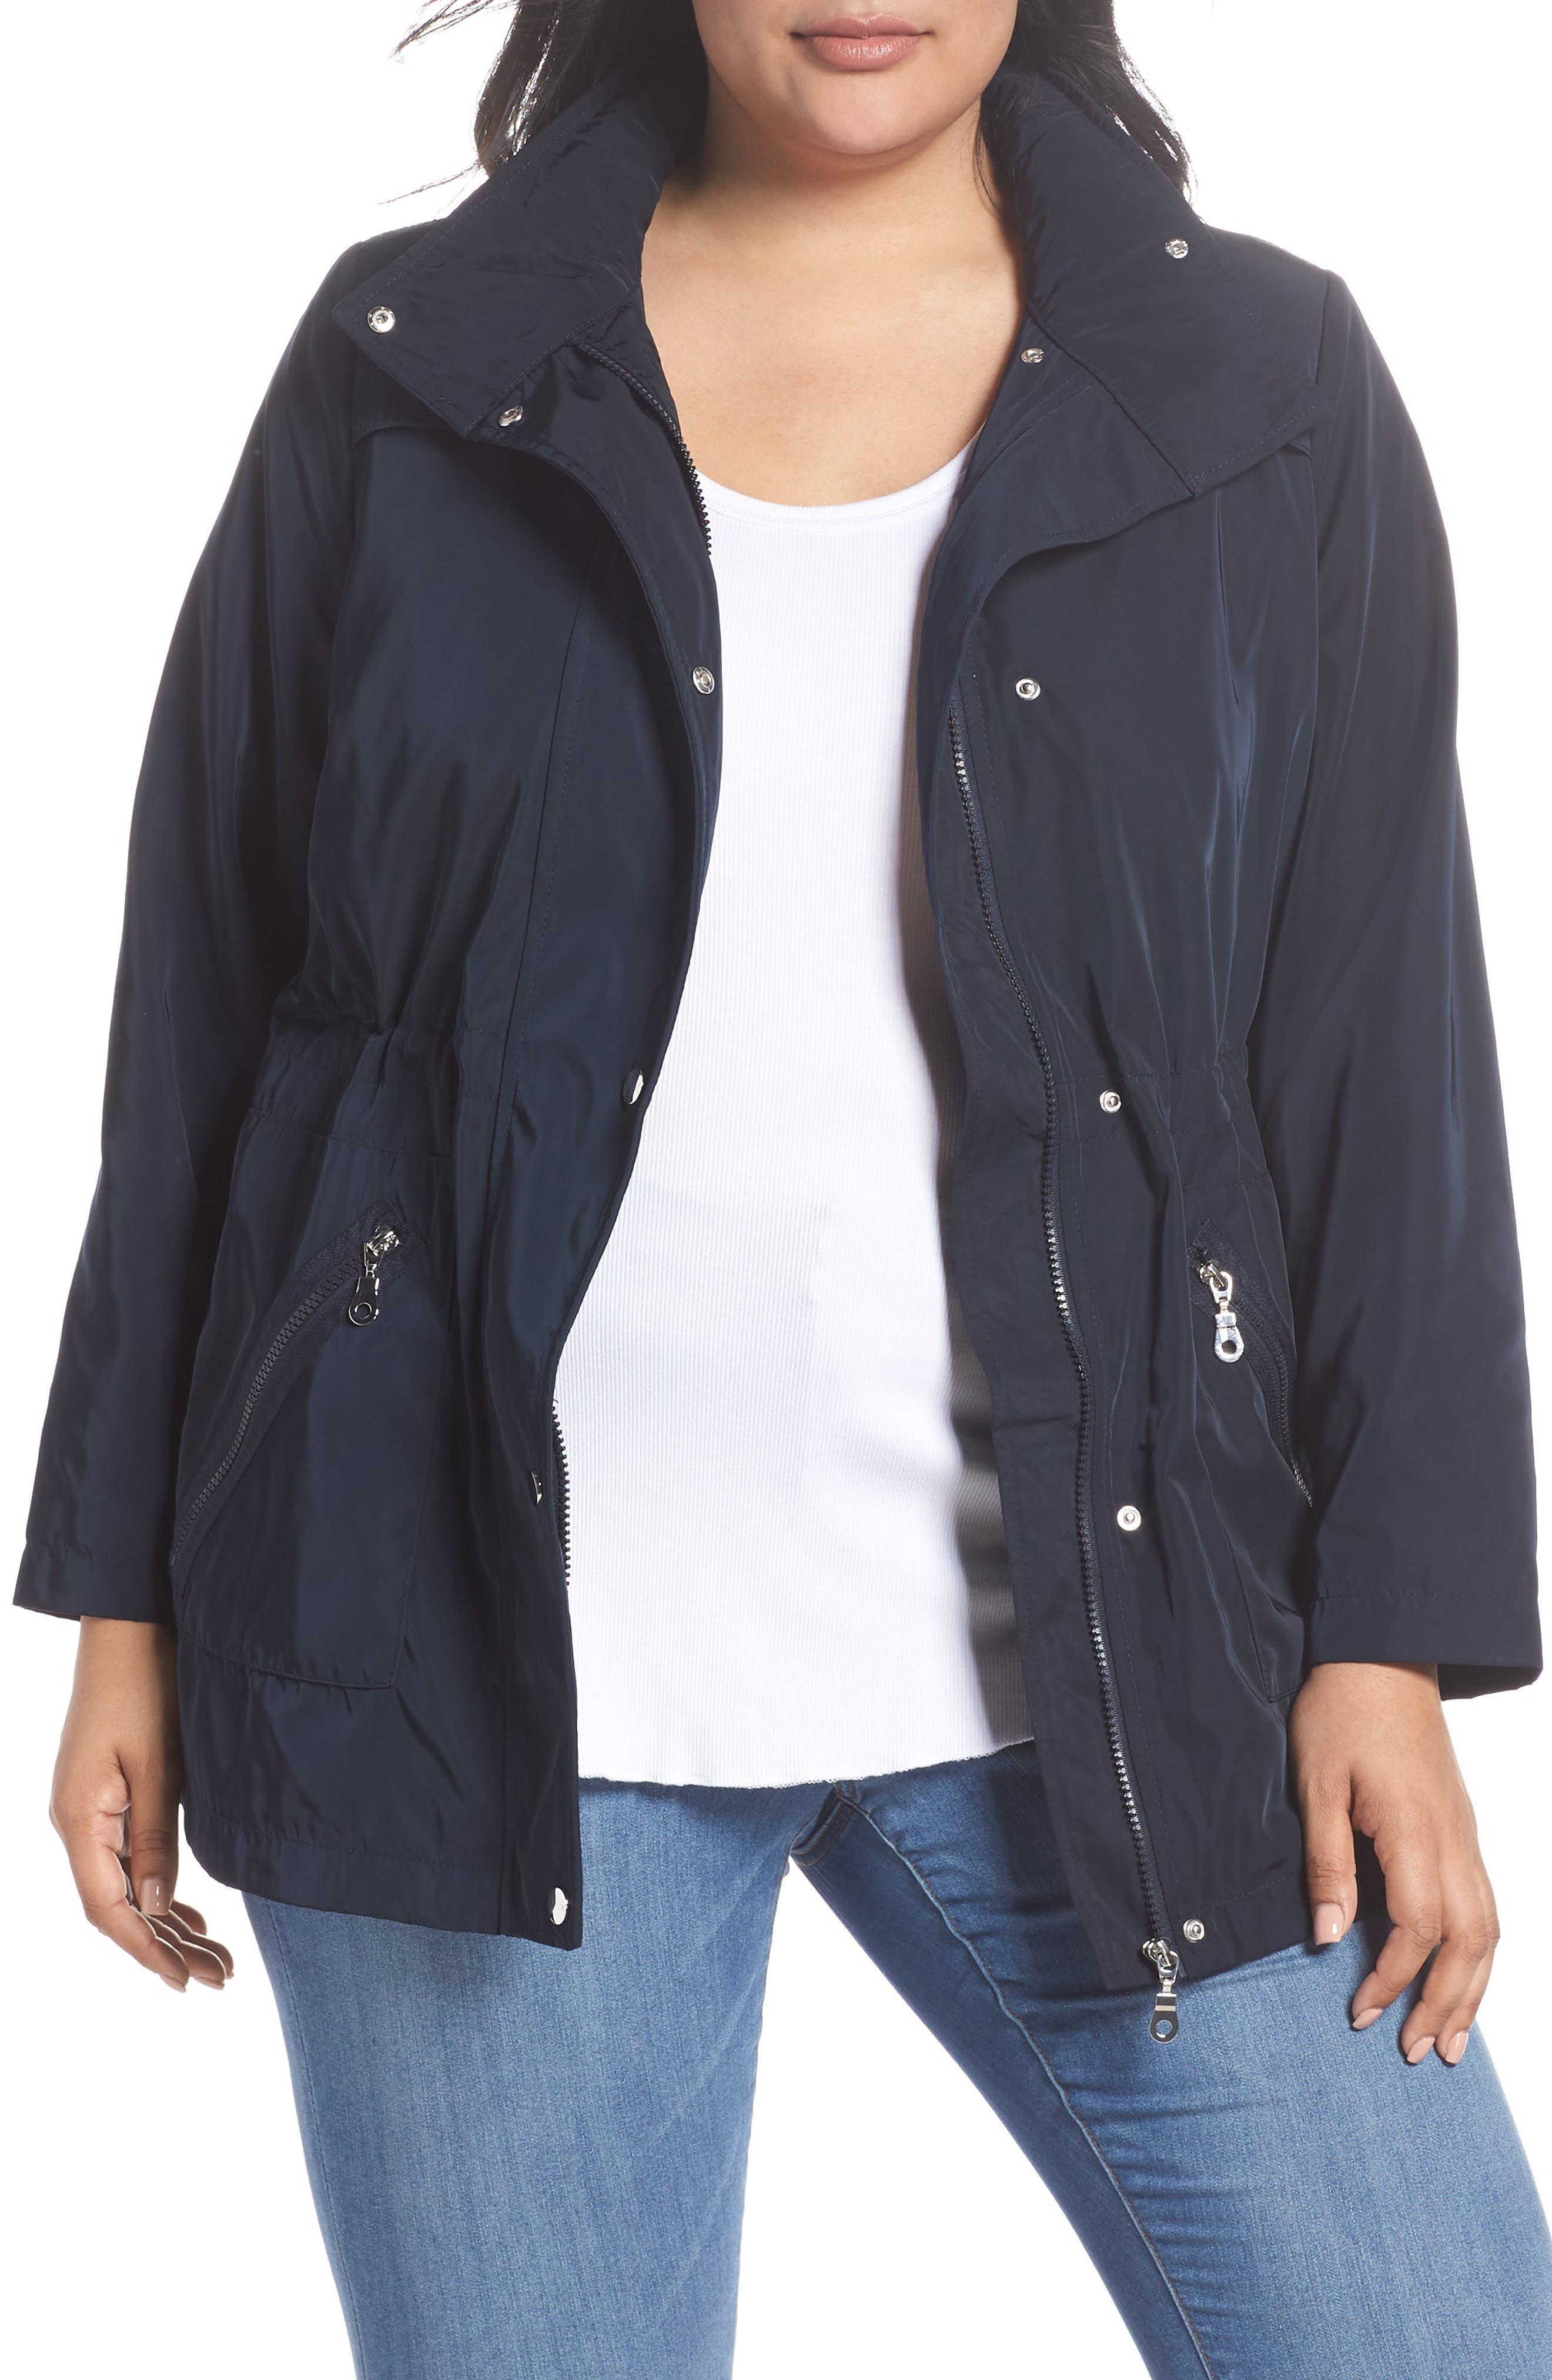 Zip Trim Jacket,                             Main thumbnail 1, color,                             Navy Blue